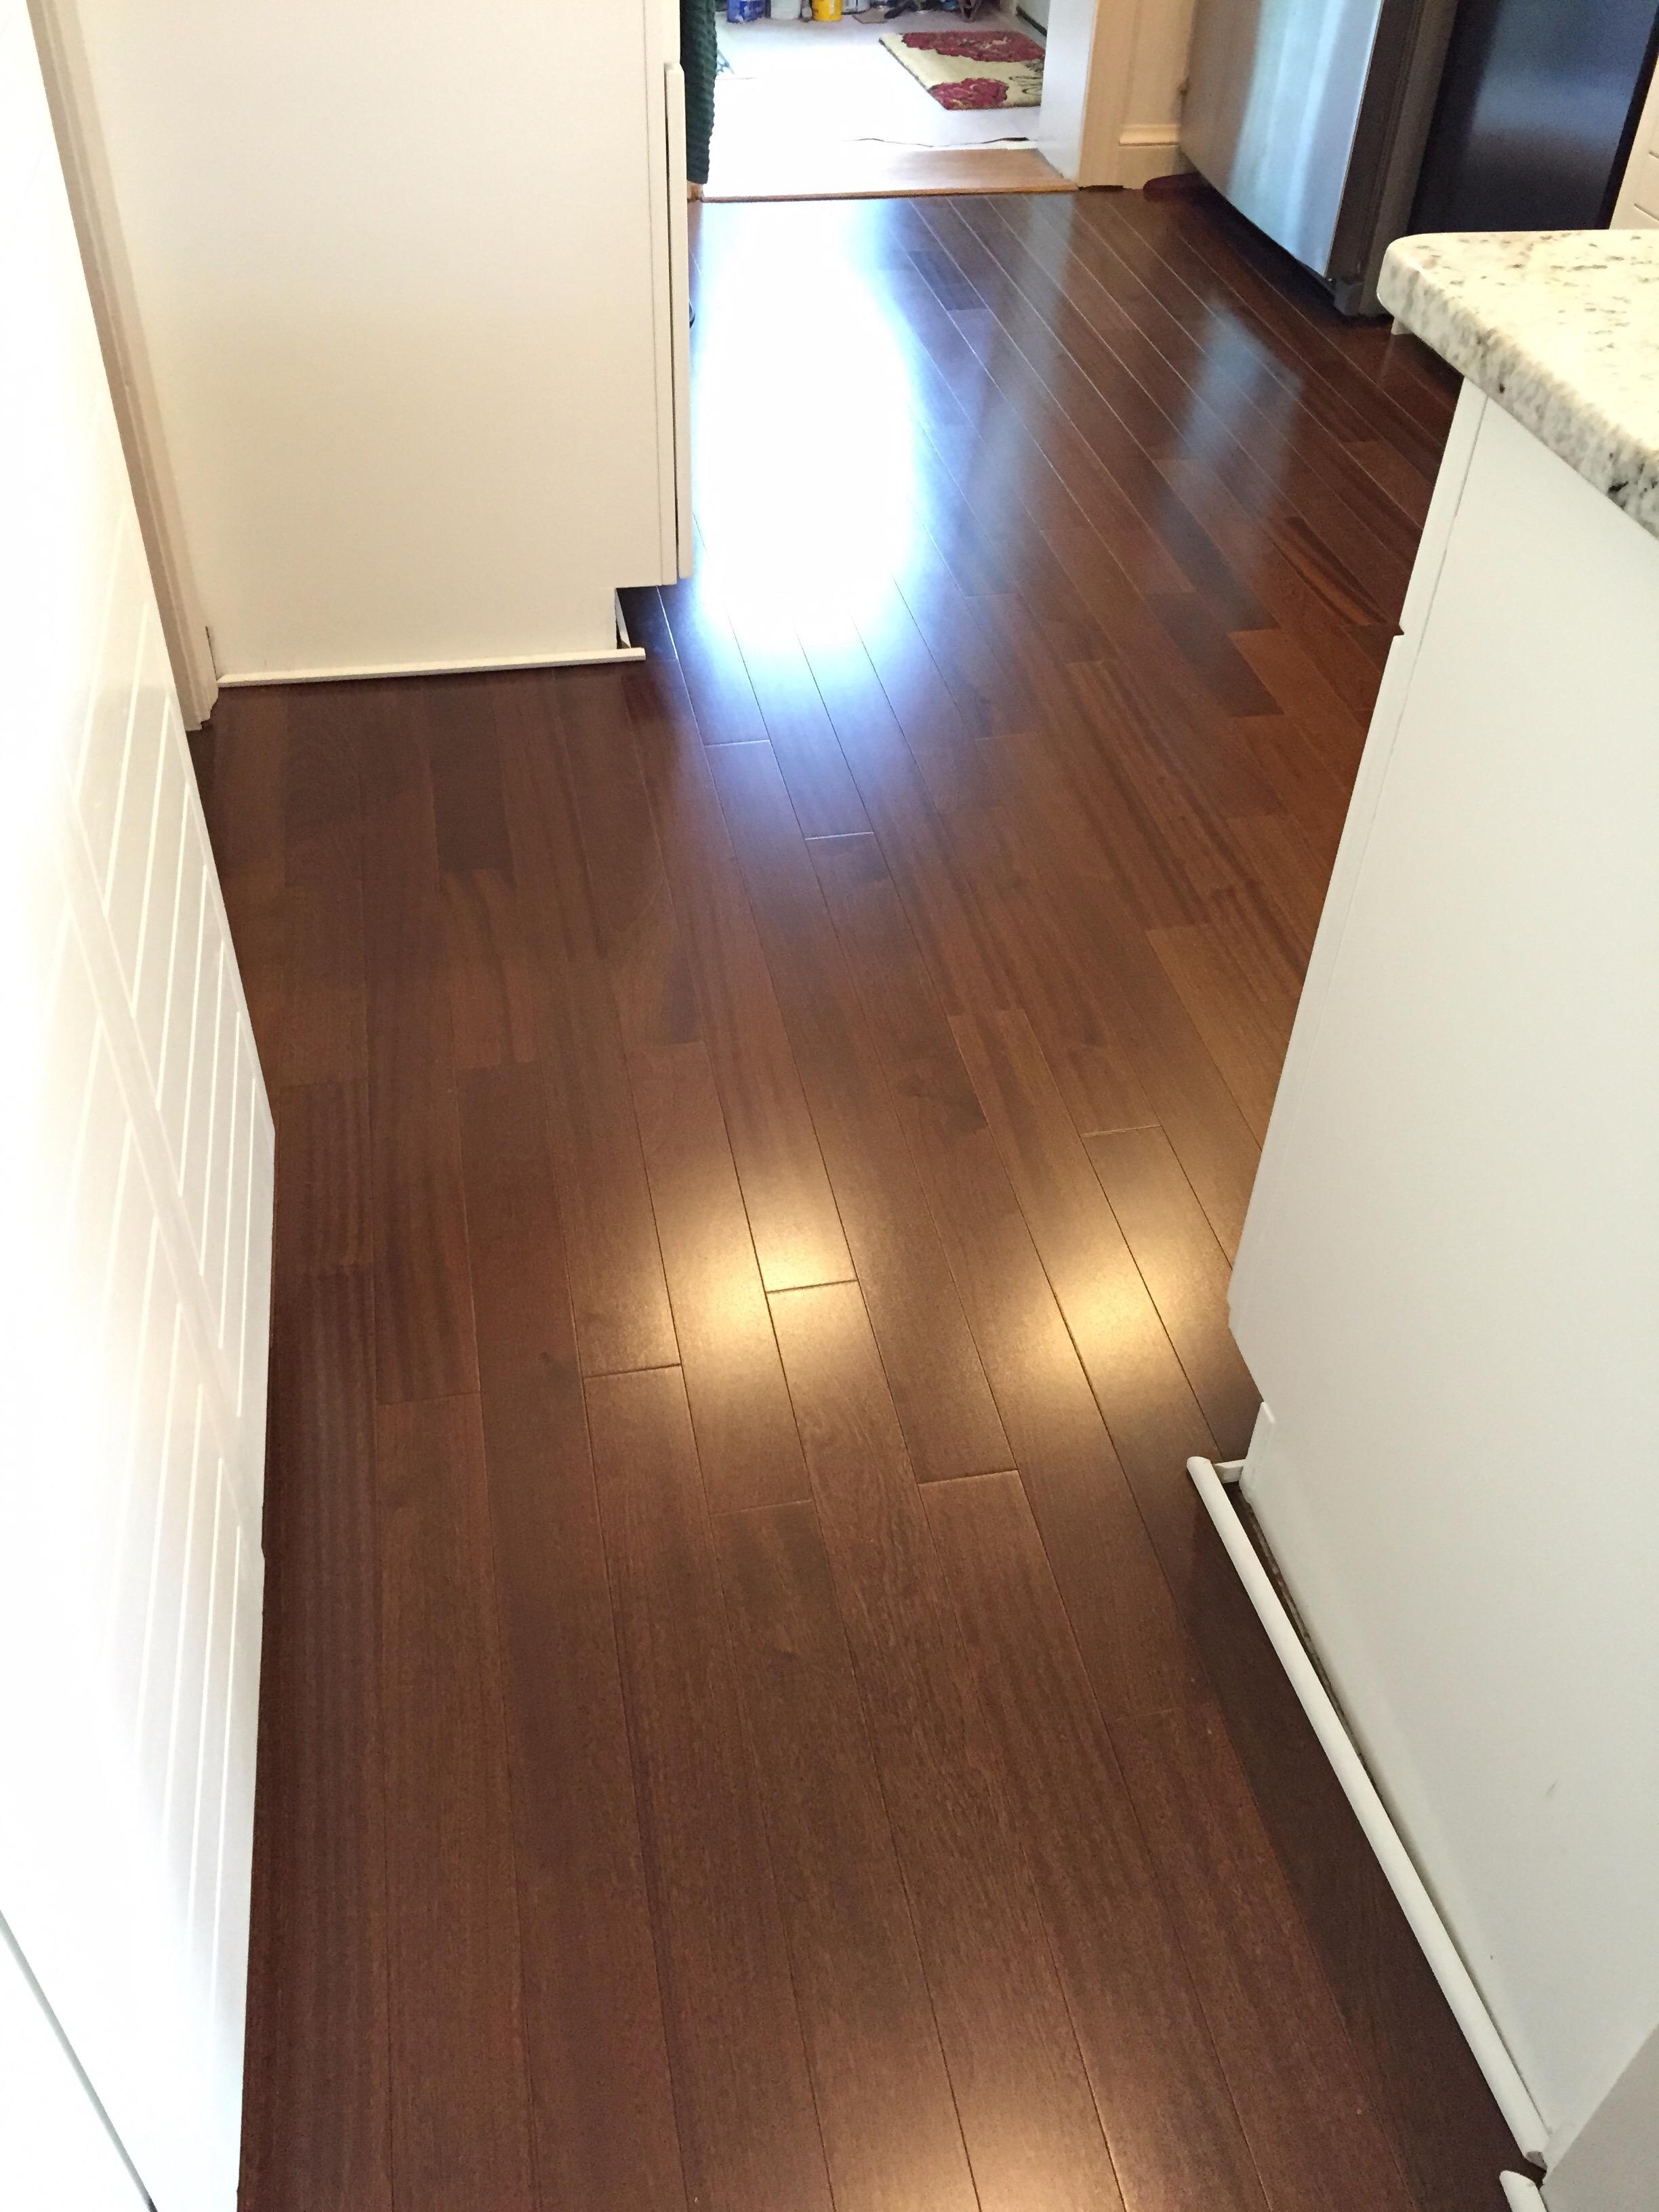 1 - Wood Kitchen Floor.jpg